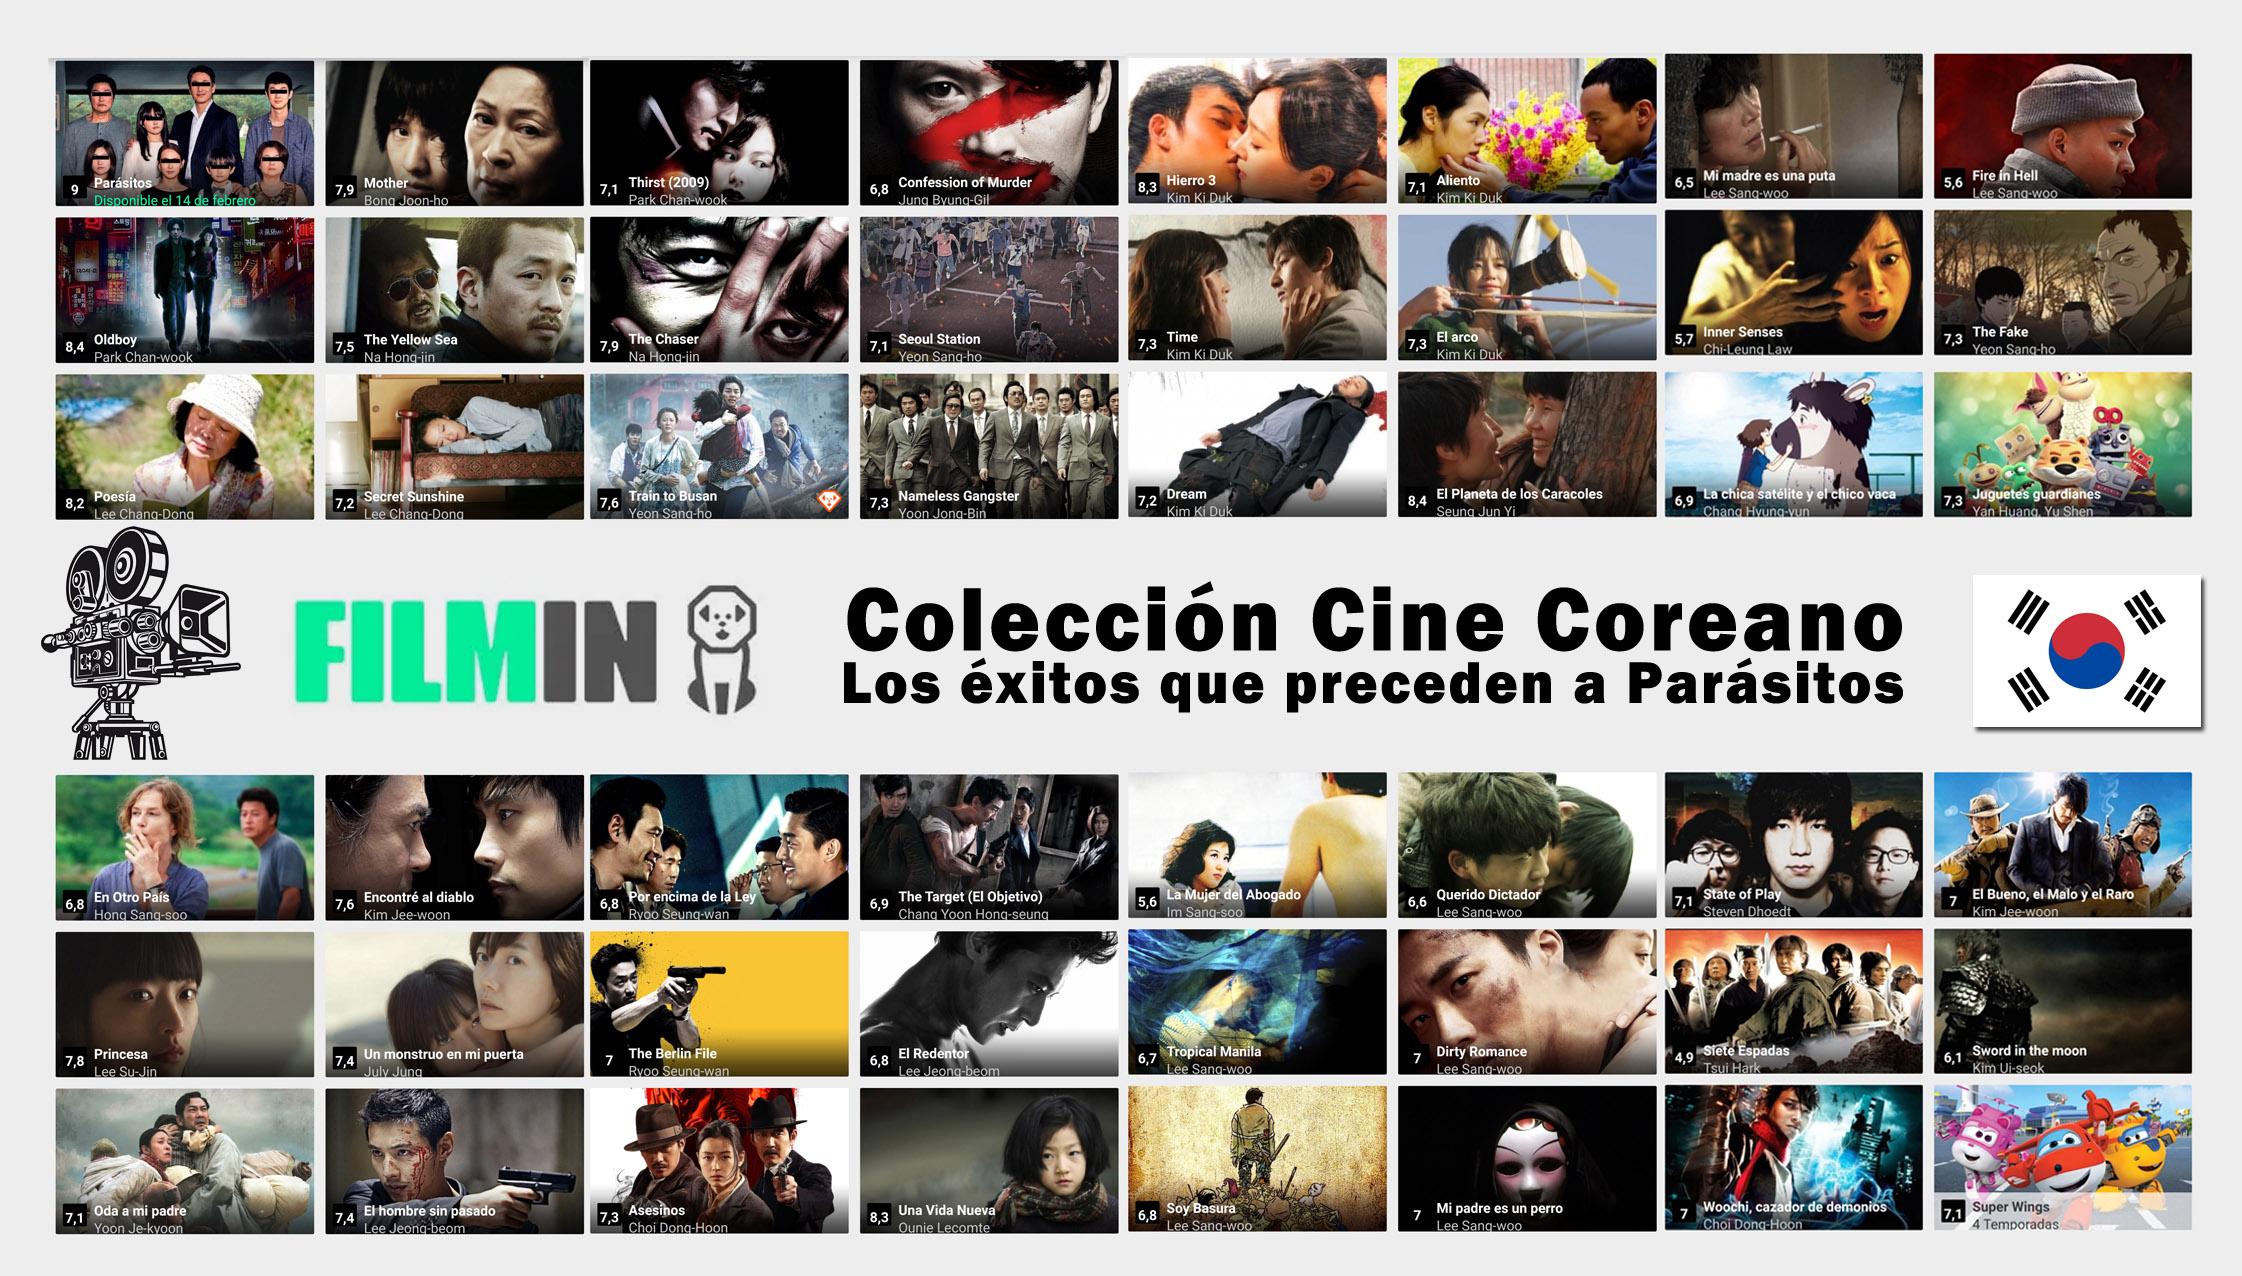 CINE-COREANO-FILMIN-02-2020.jpg